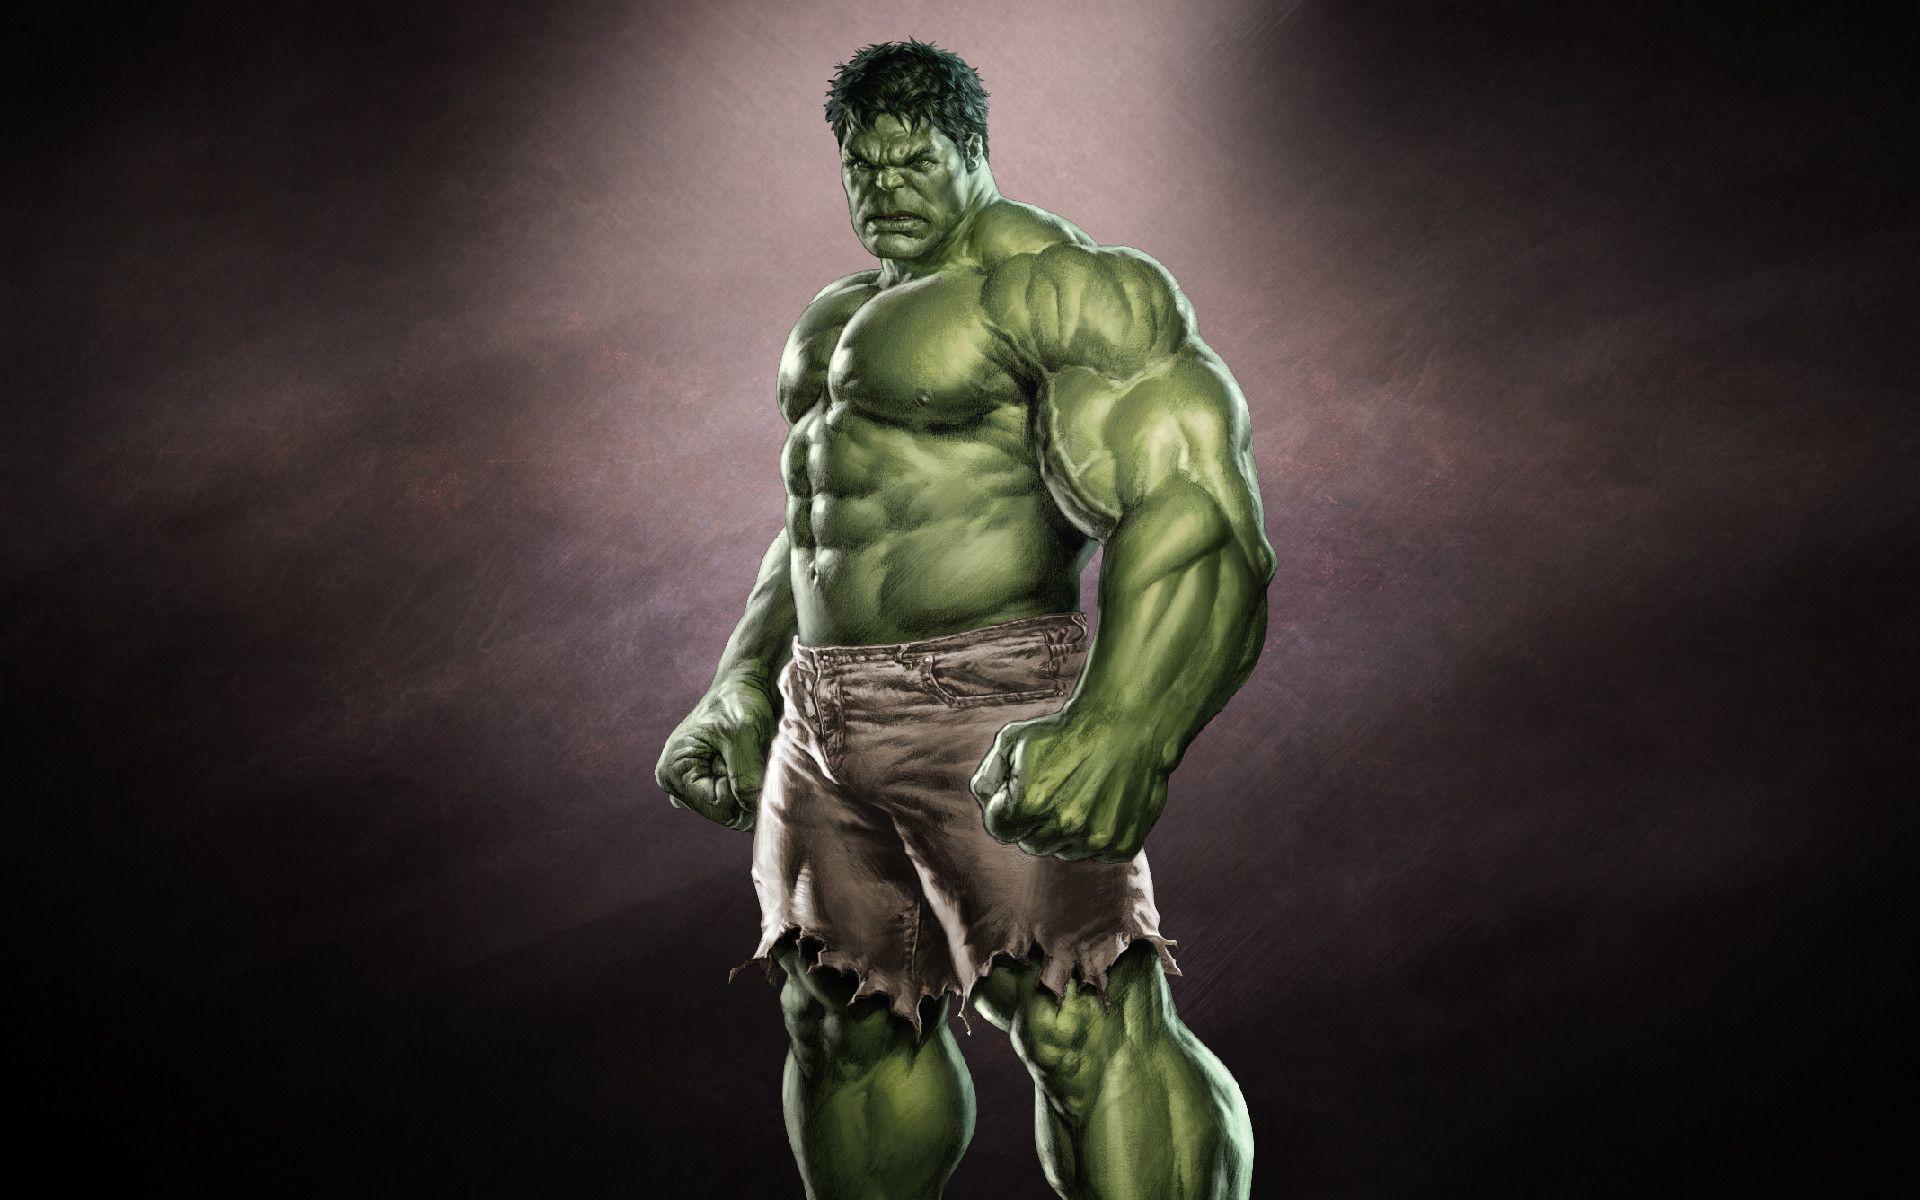 Hd Hulk Desktop Wallpapers Top Free Hd Hulk Desktop Backgrounds